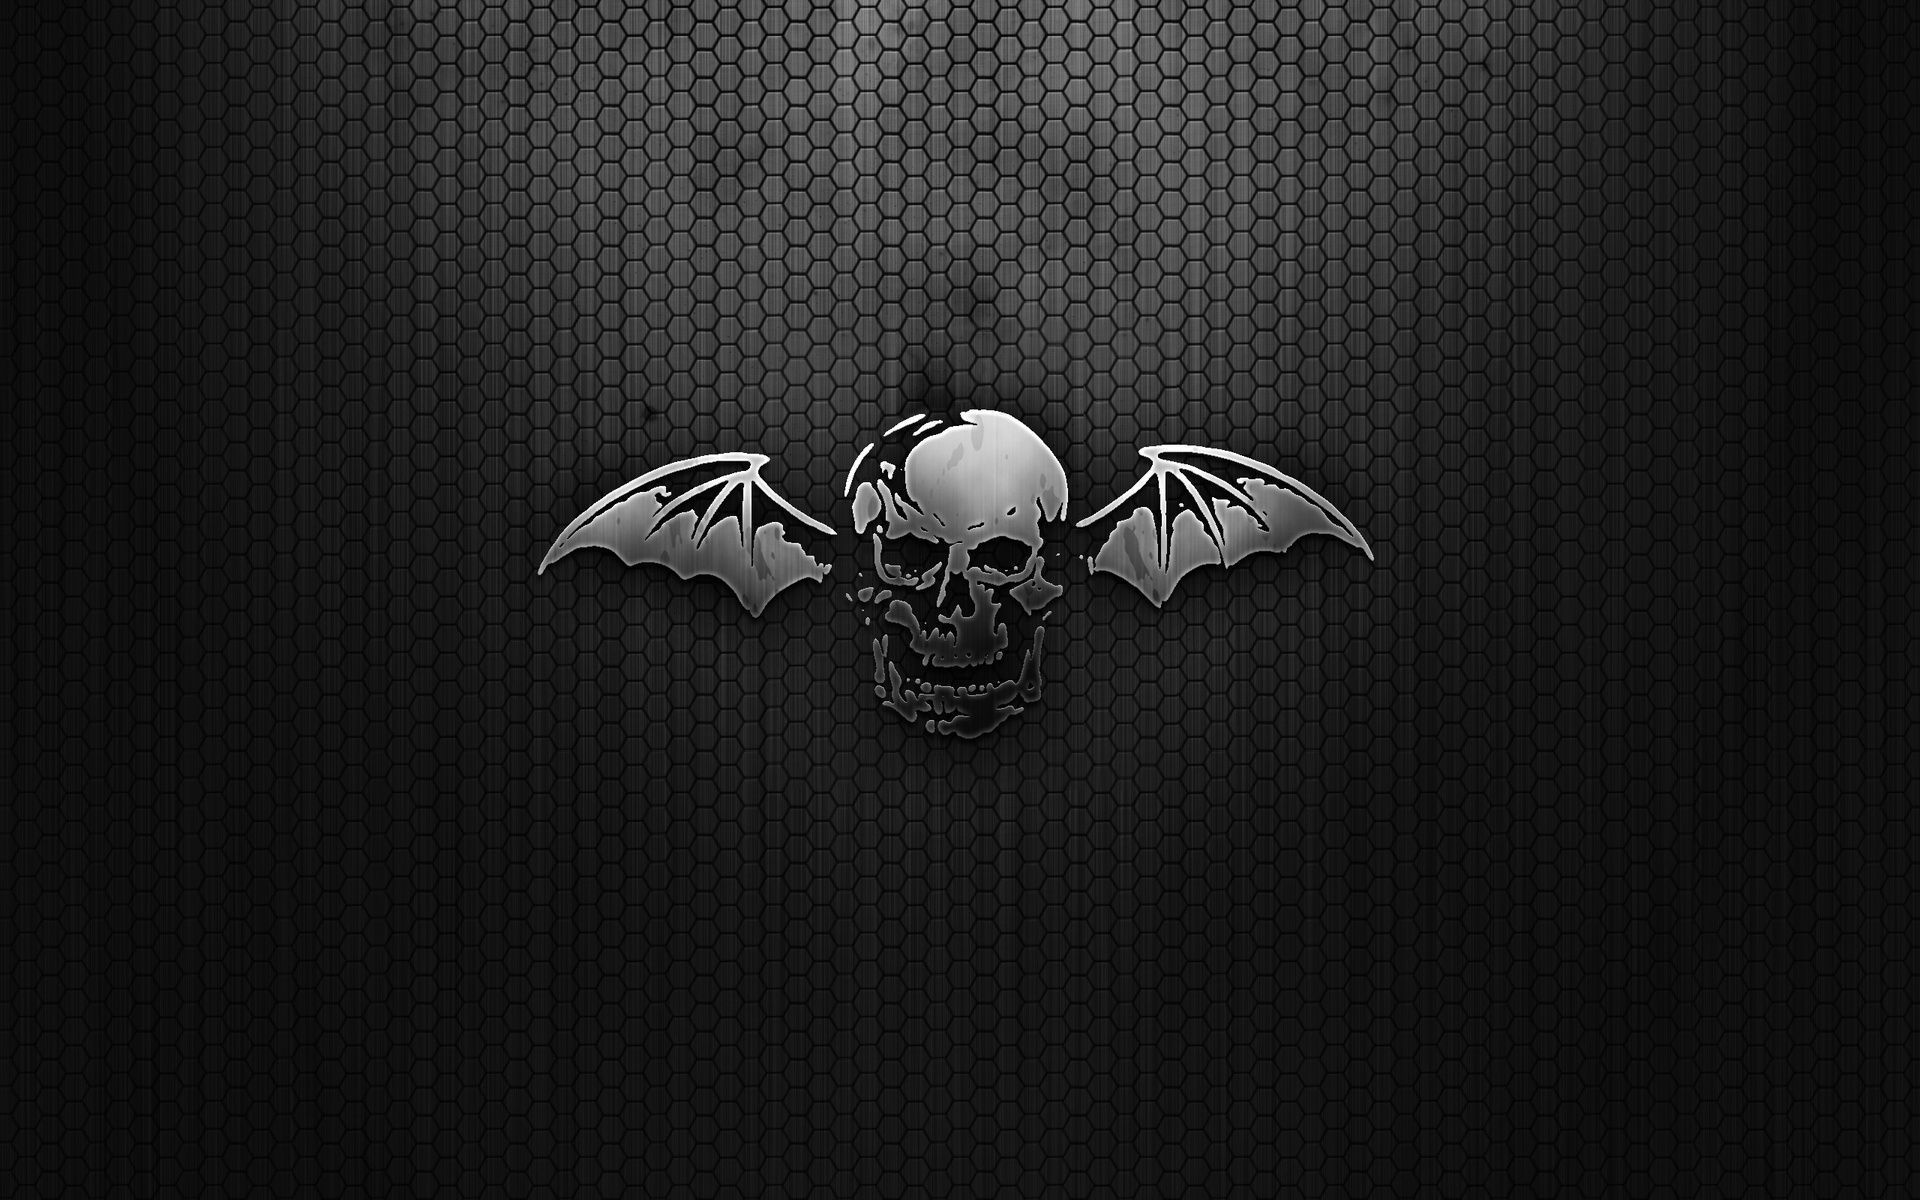 Avenged sevenfold logo wallpaper hd wallpapers pinterest avenged sevenfold logo wallpaper voltagebd Gallery